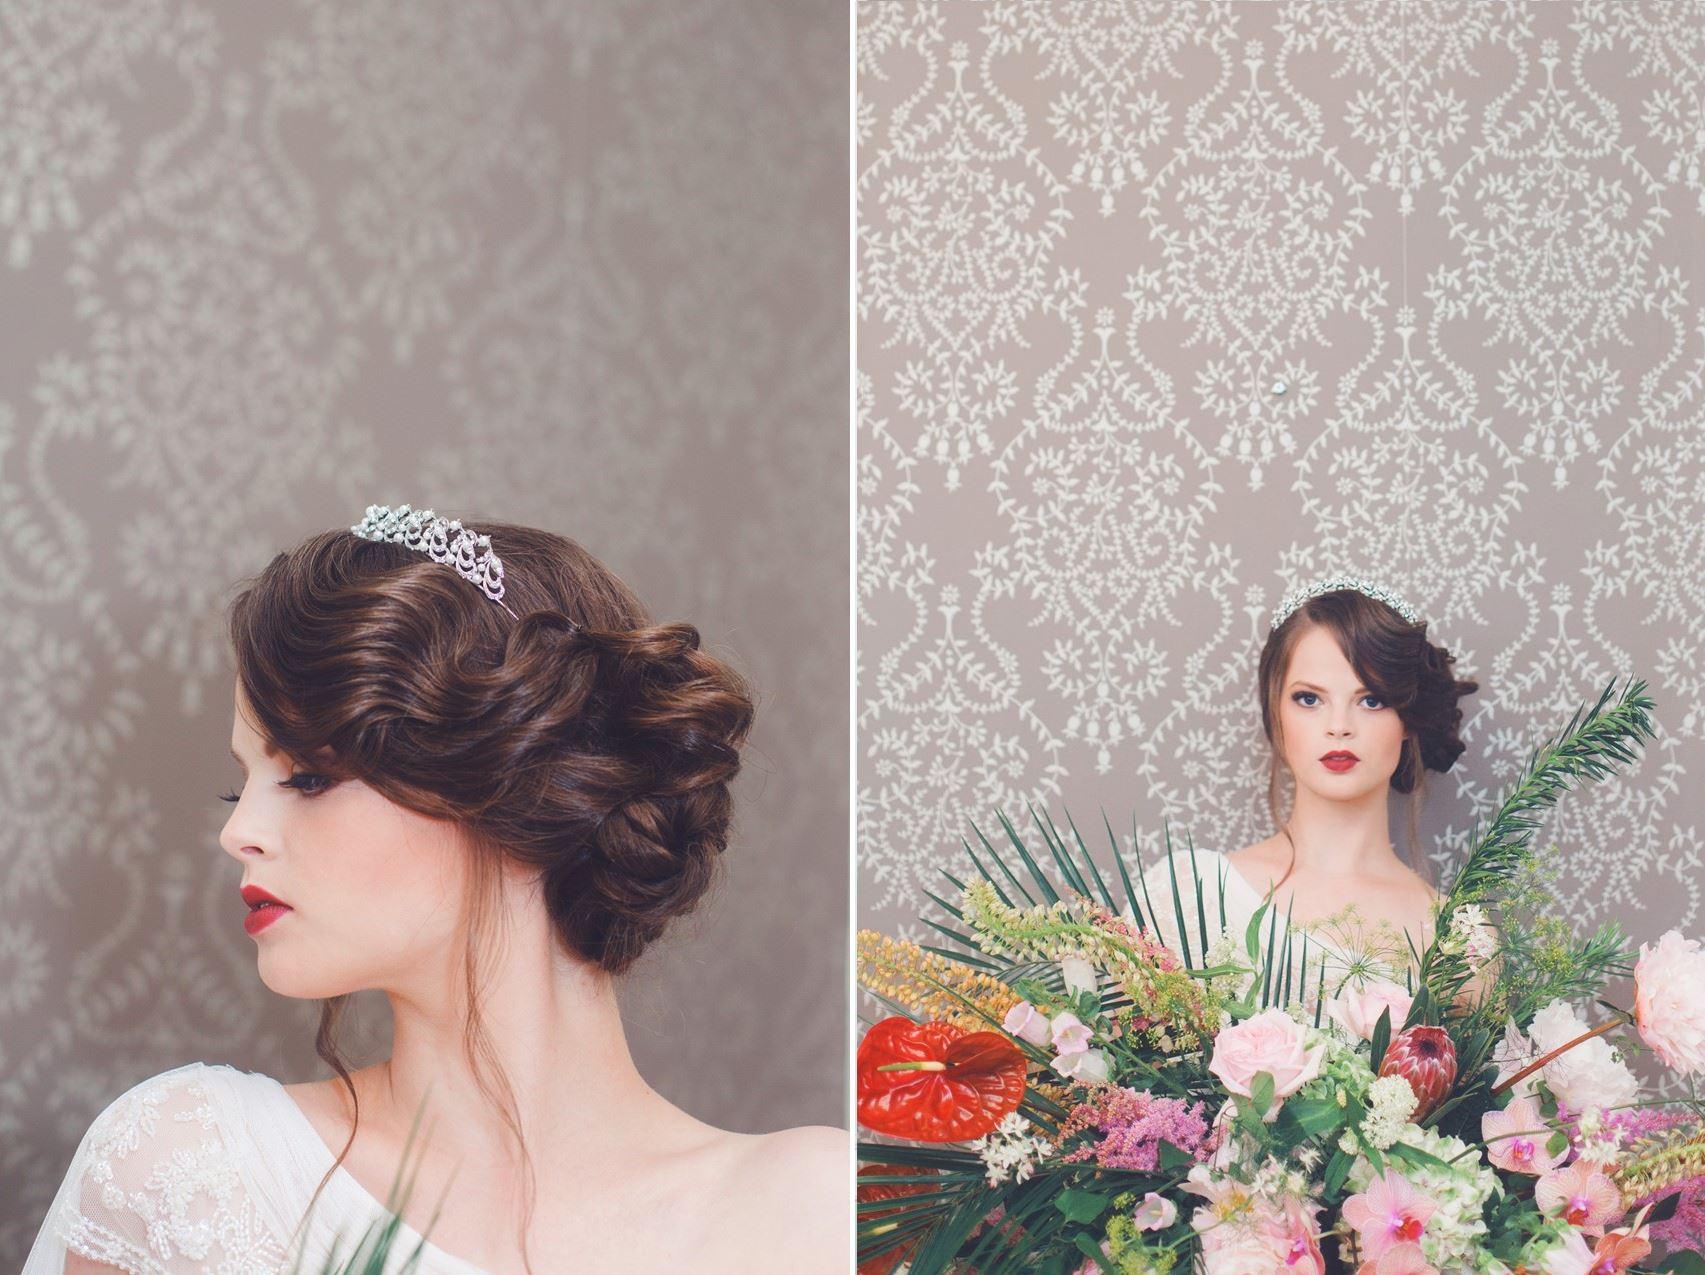 Art Deco Bridal Hair - A 1920s Speakeasy-Inspired Wedding Styled Shoot